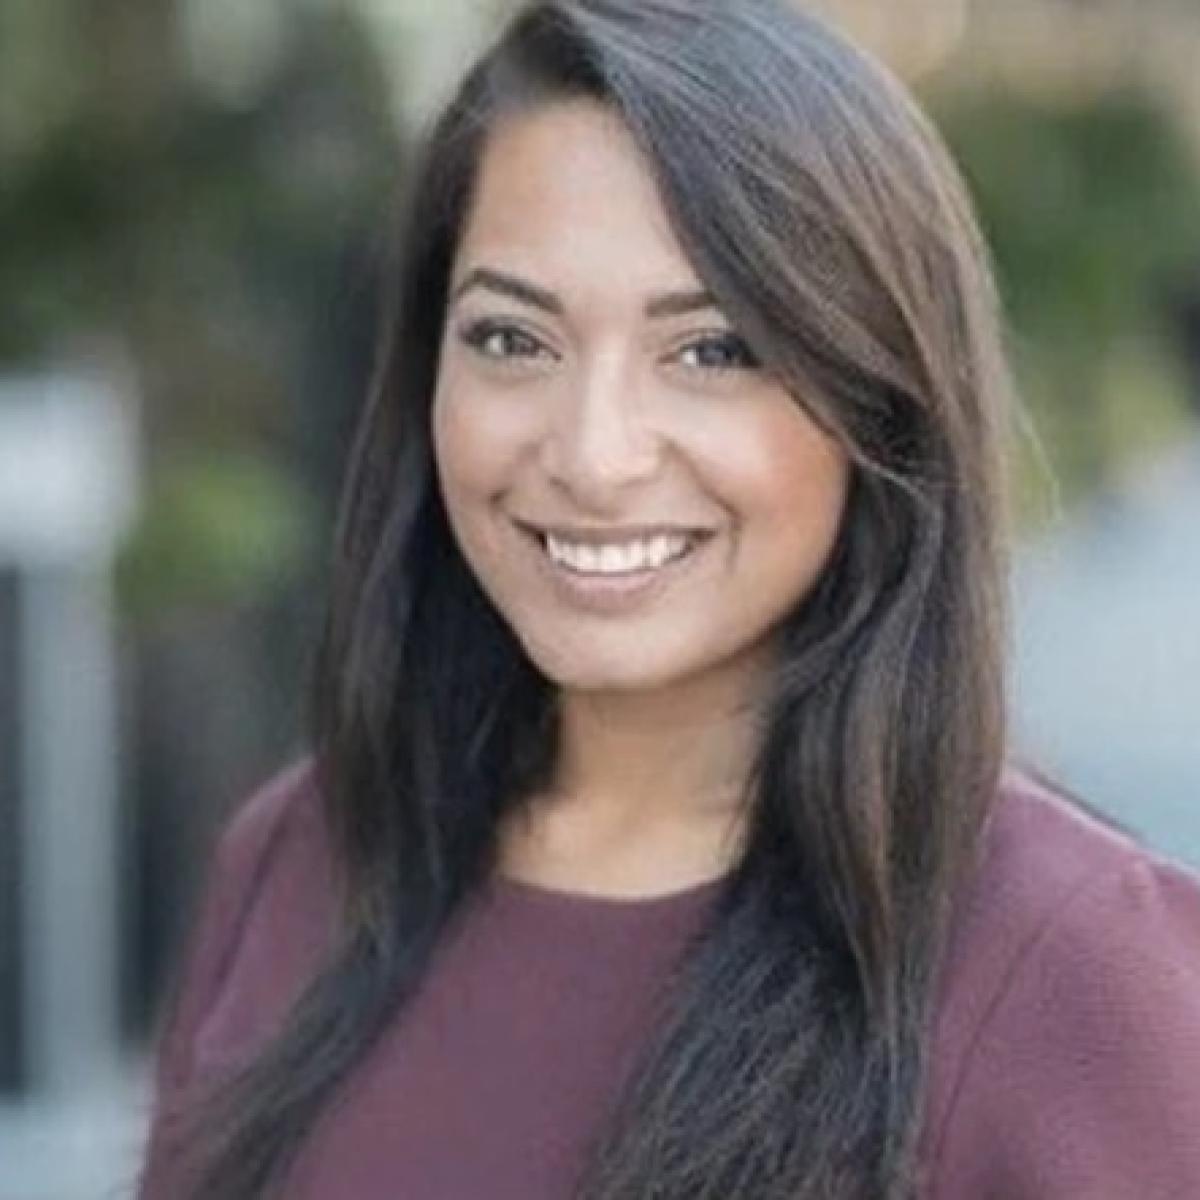 India-born Aisha Shah bags senior position in Joe Biden's digital team